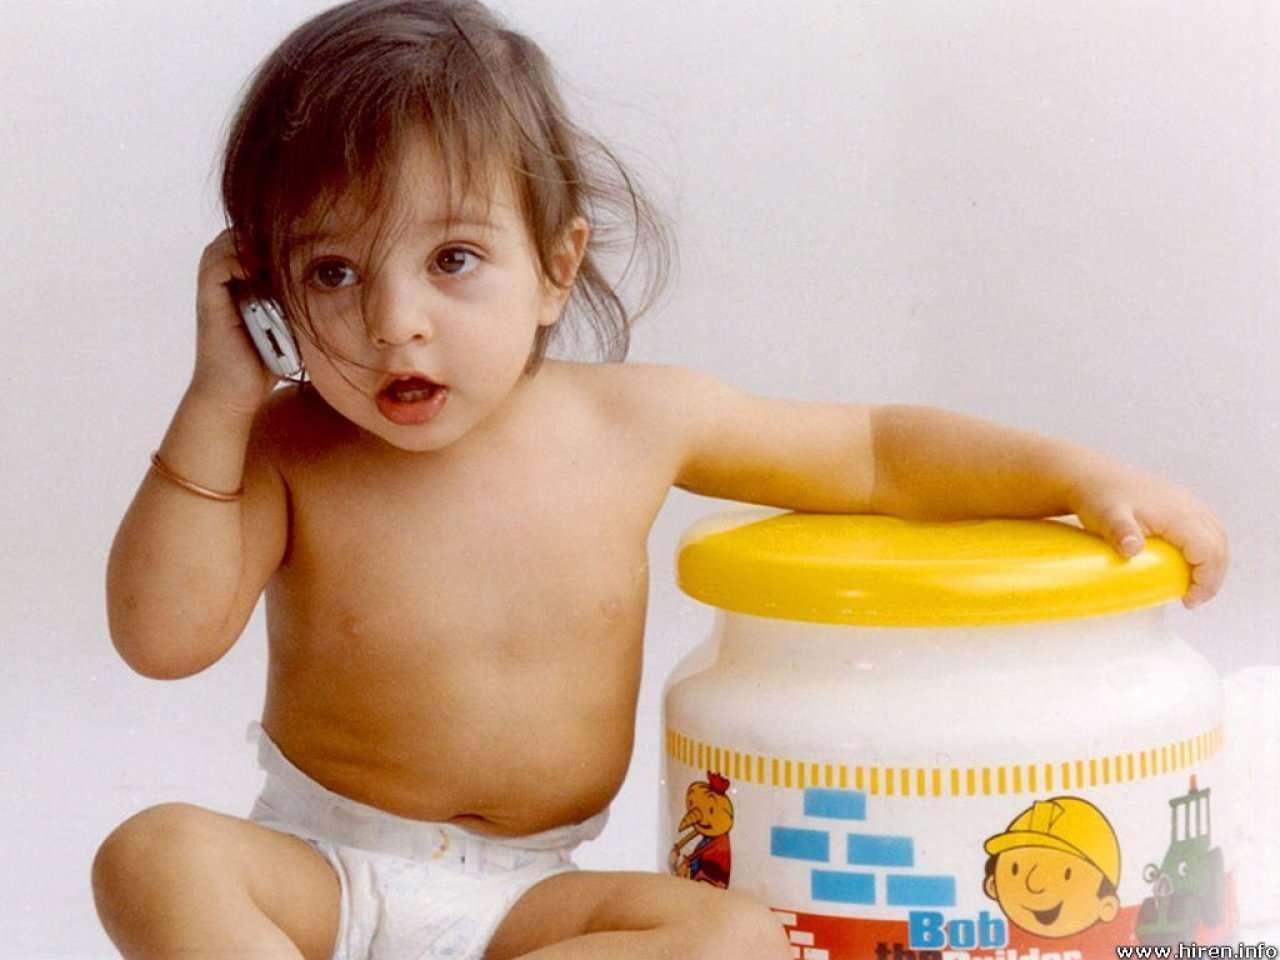 Wallpaper download baby boy - Wallpapers Of Babies For Mobile Wallpapersafari Cute